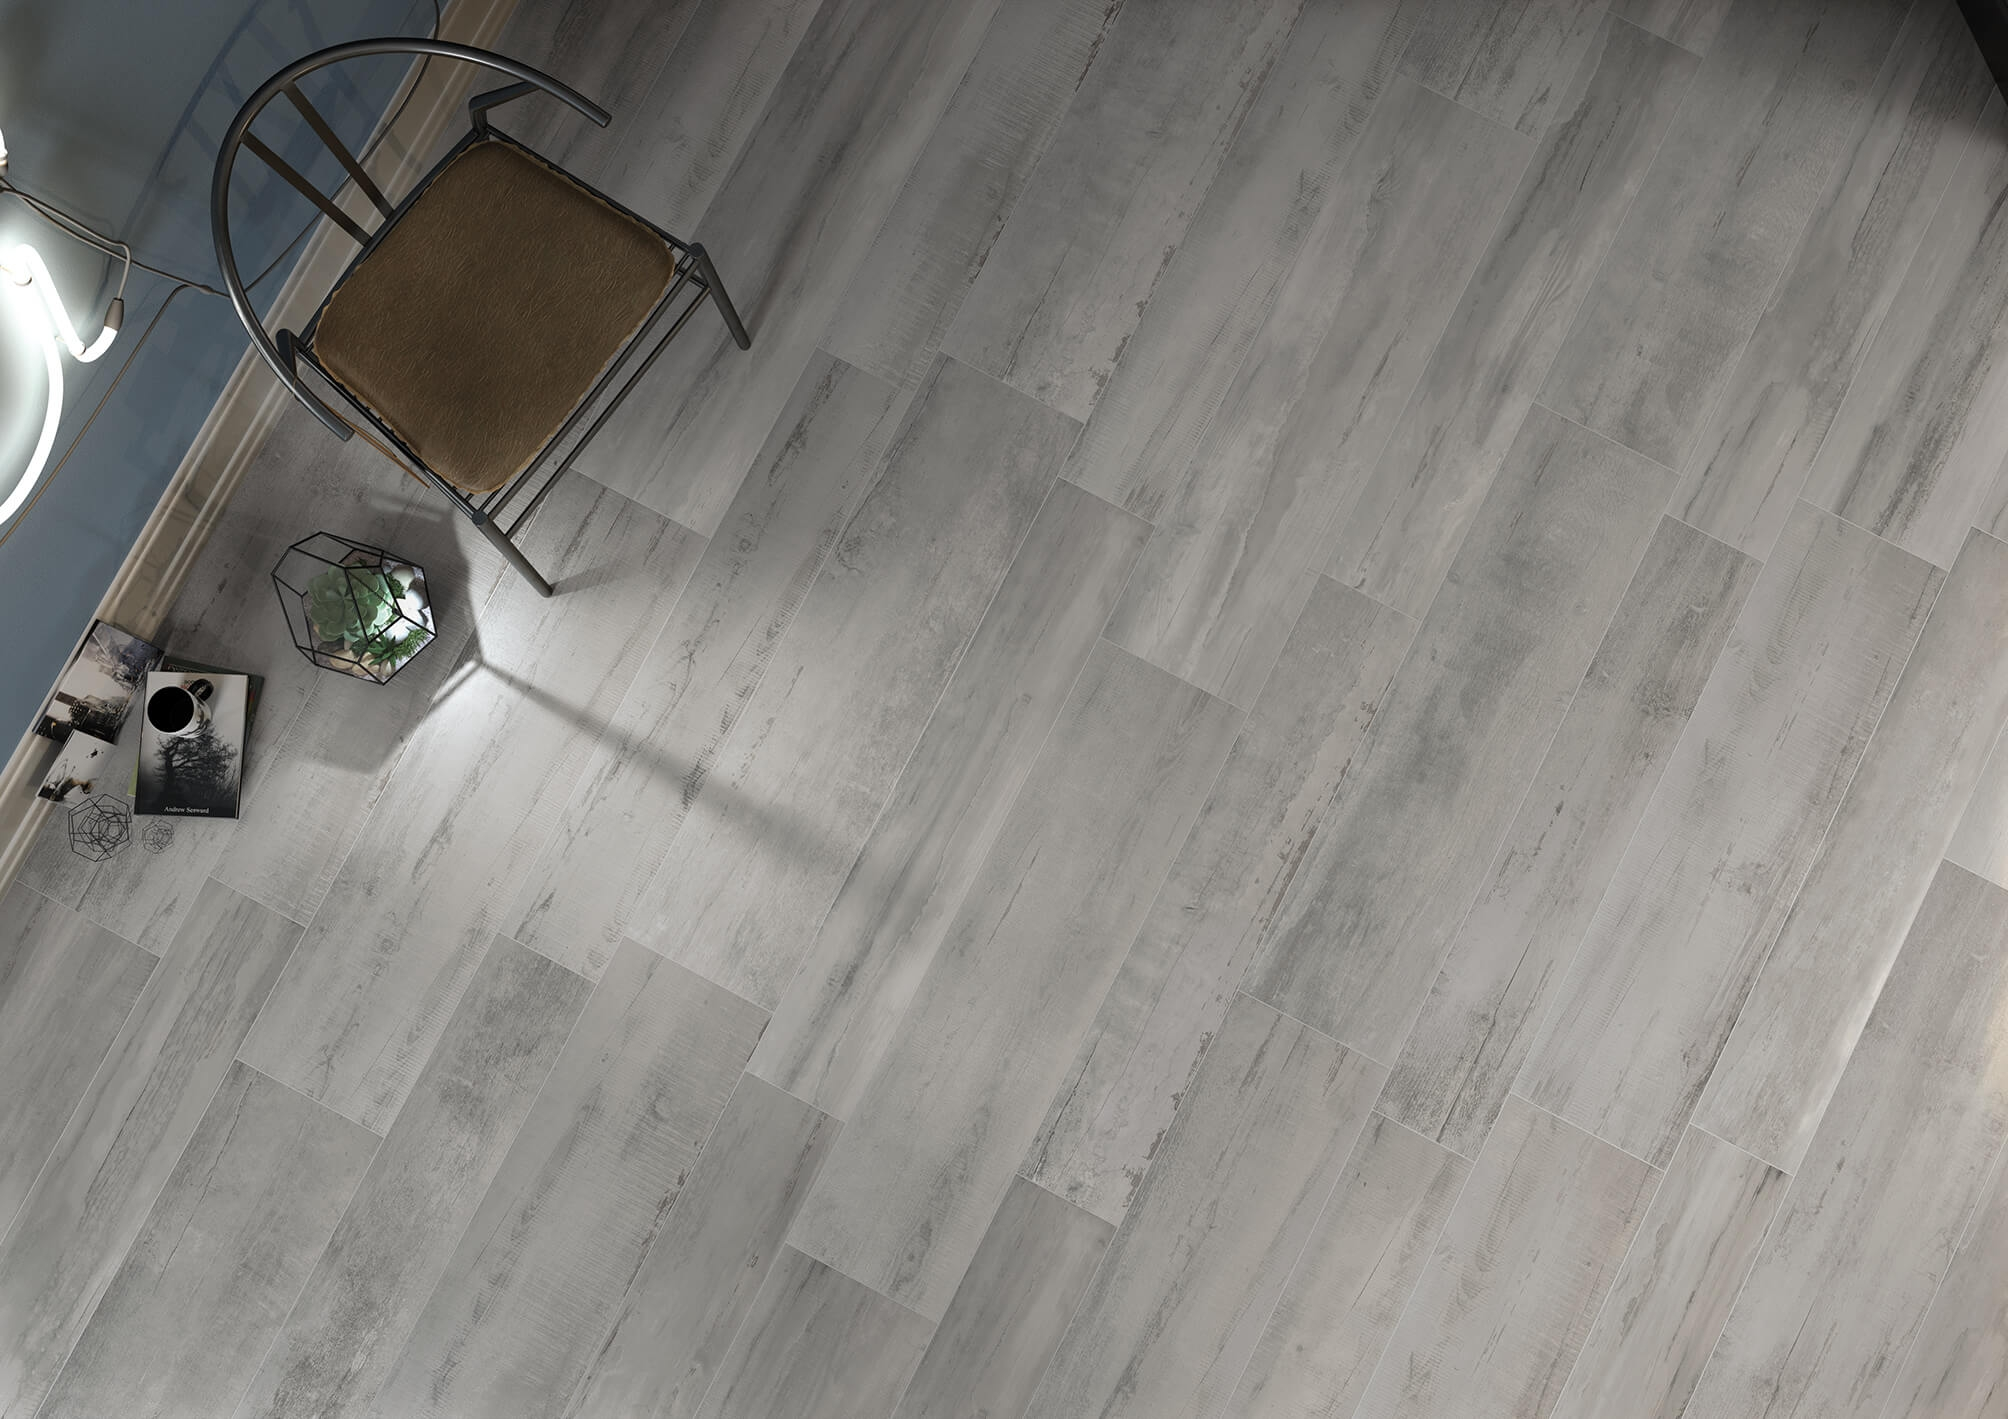 Umbra Grey Tiles in a random bond effect.